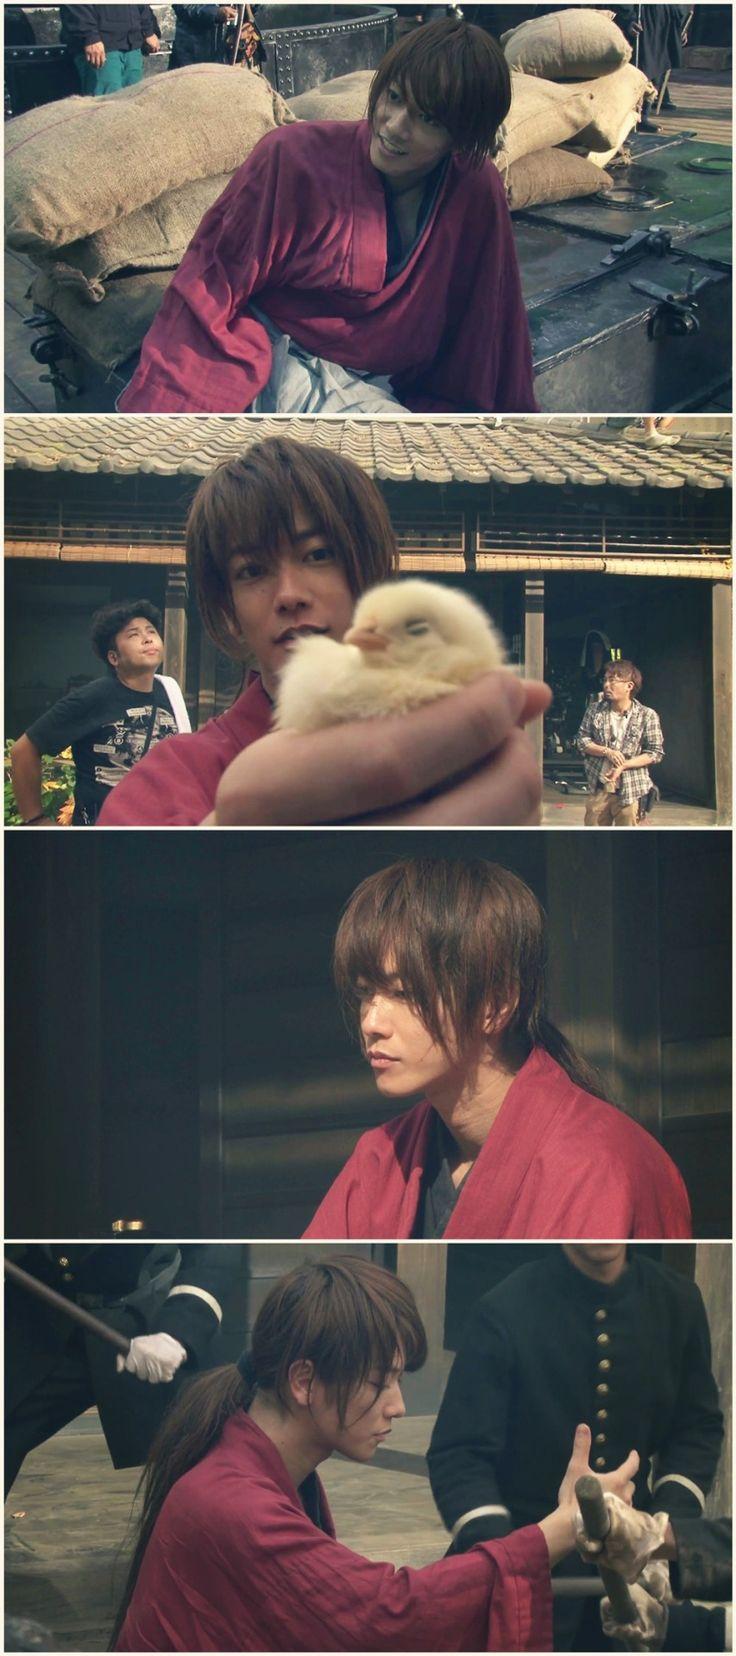 529 basis st Rurouni Kenshin Billede s favør Pintere st Ken Sato-3423